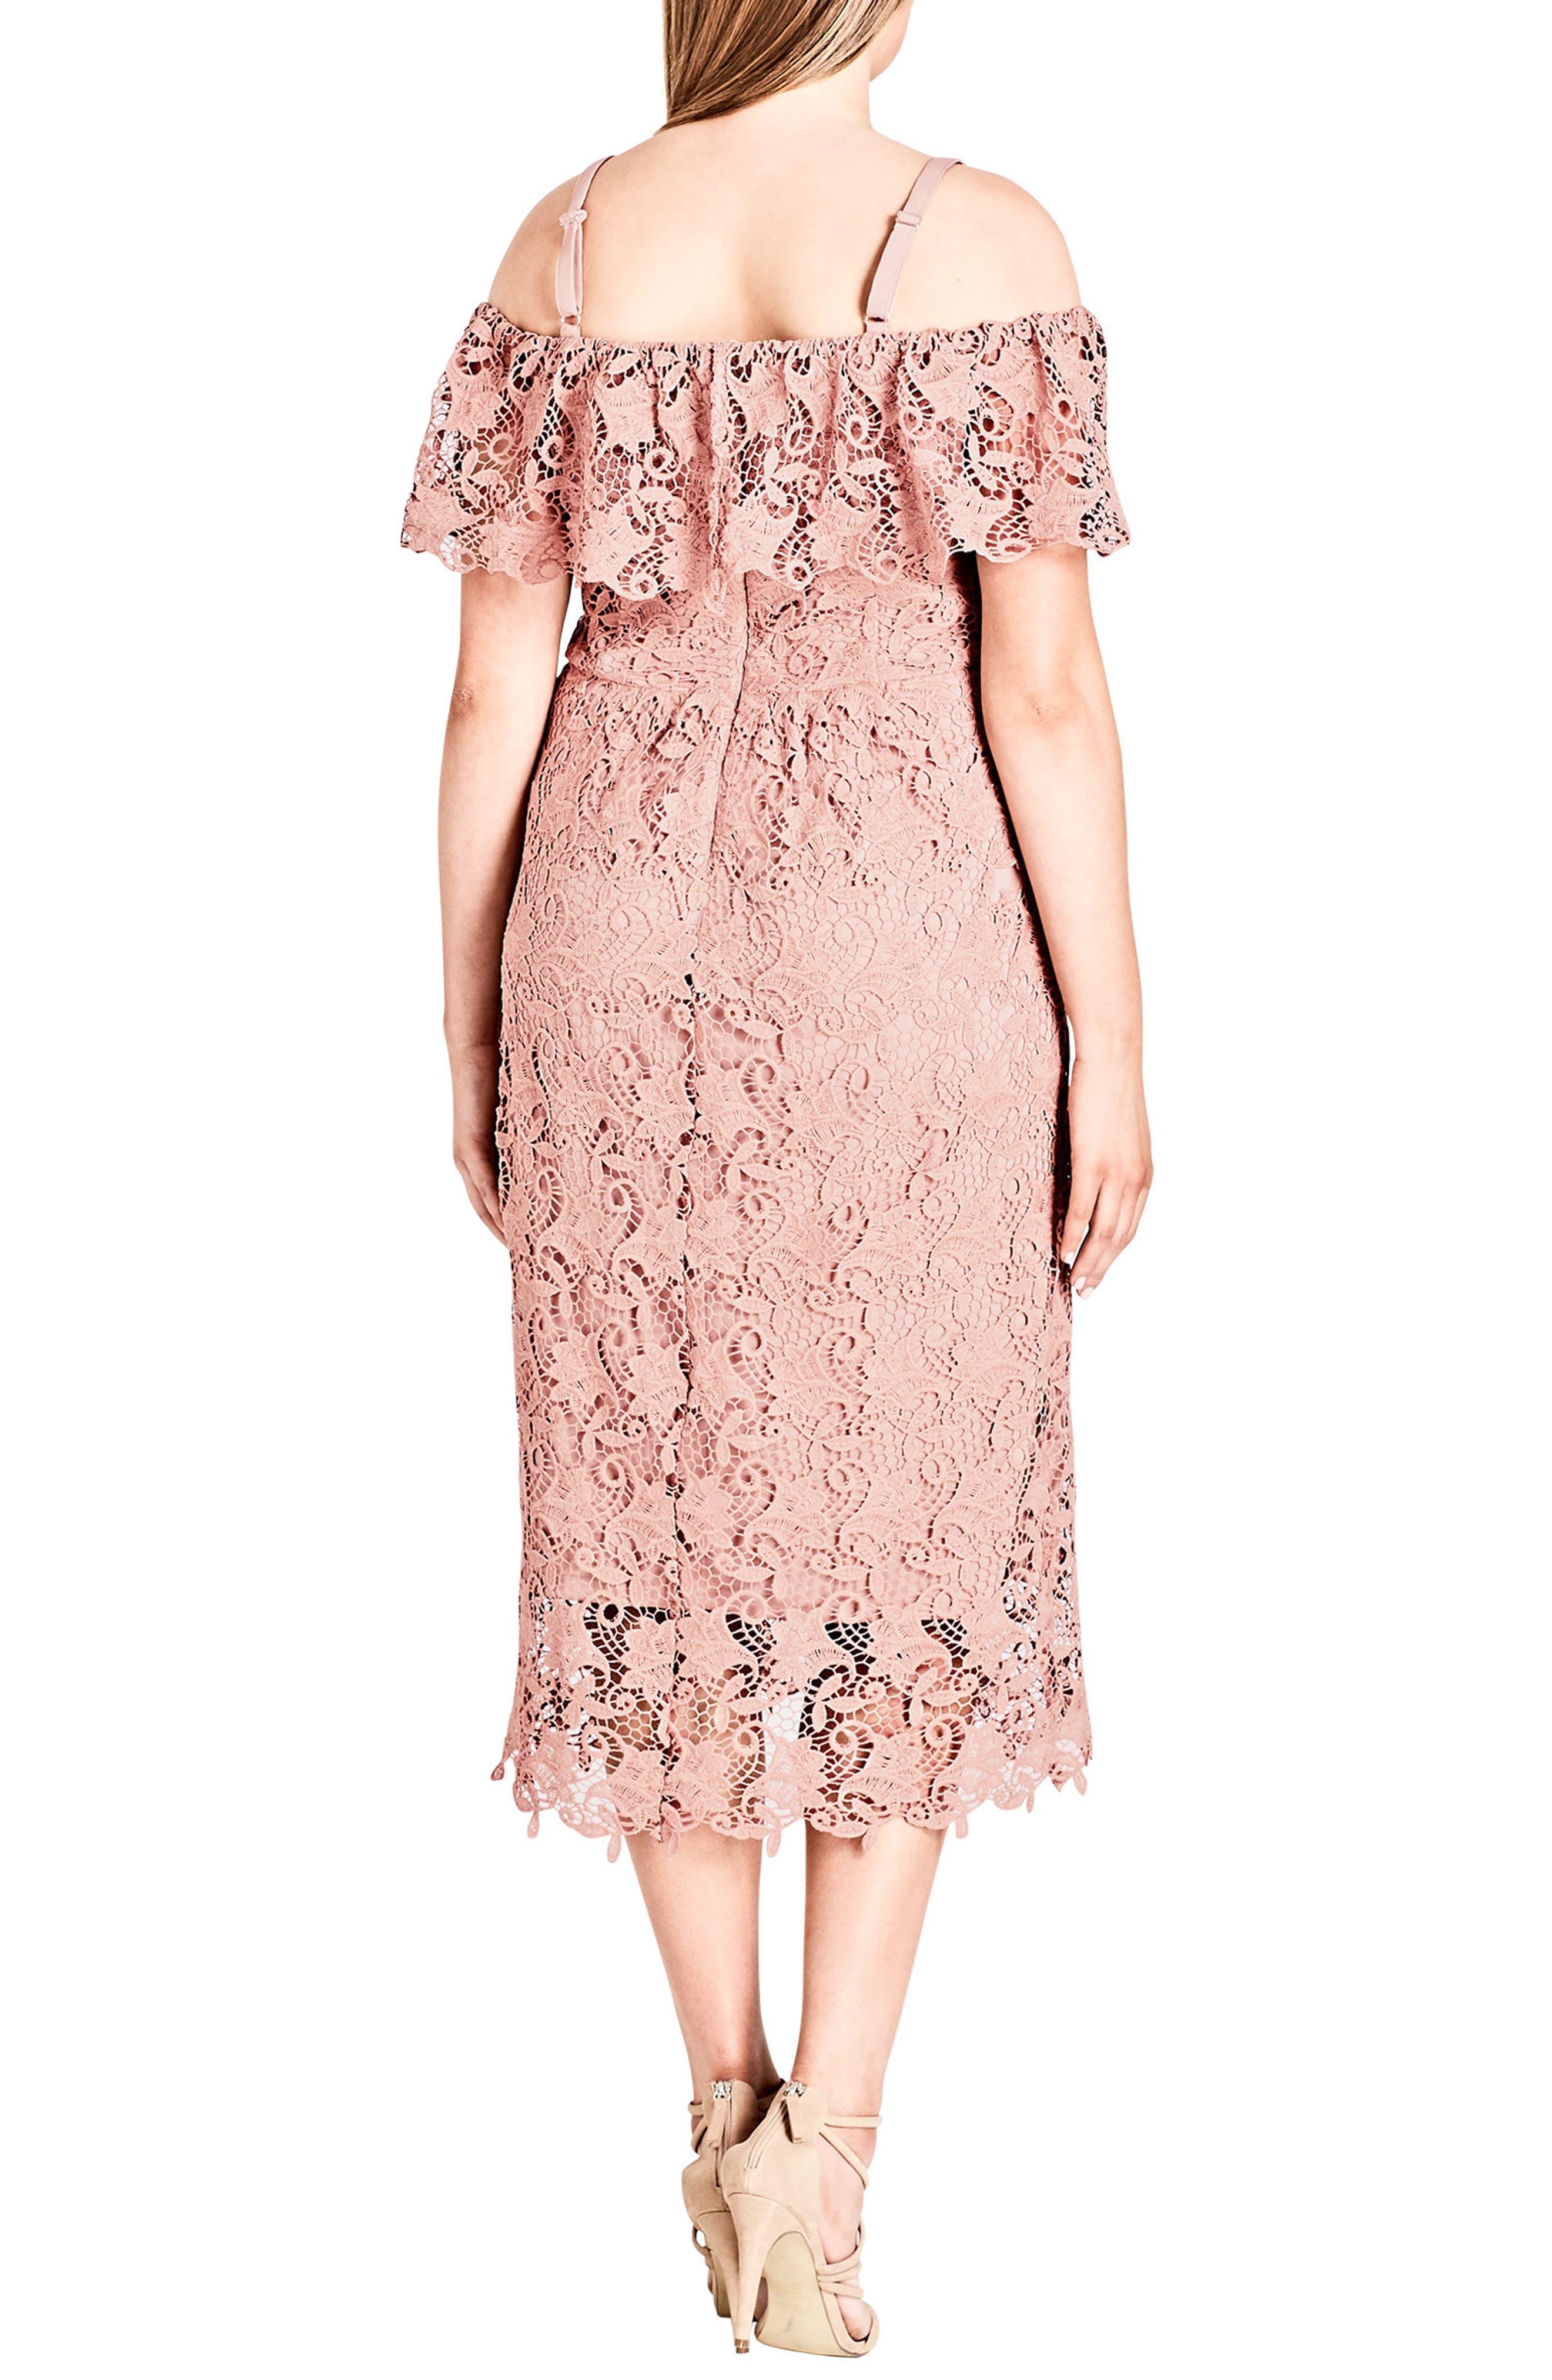 Spring Day Off the Shoulder Lace Sheath Dress,                             Alternate thumbnail 2, color,                             Ballet Pink